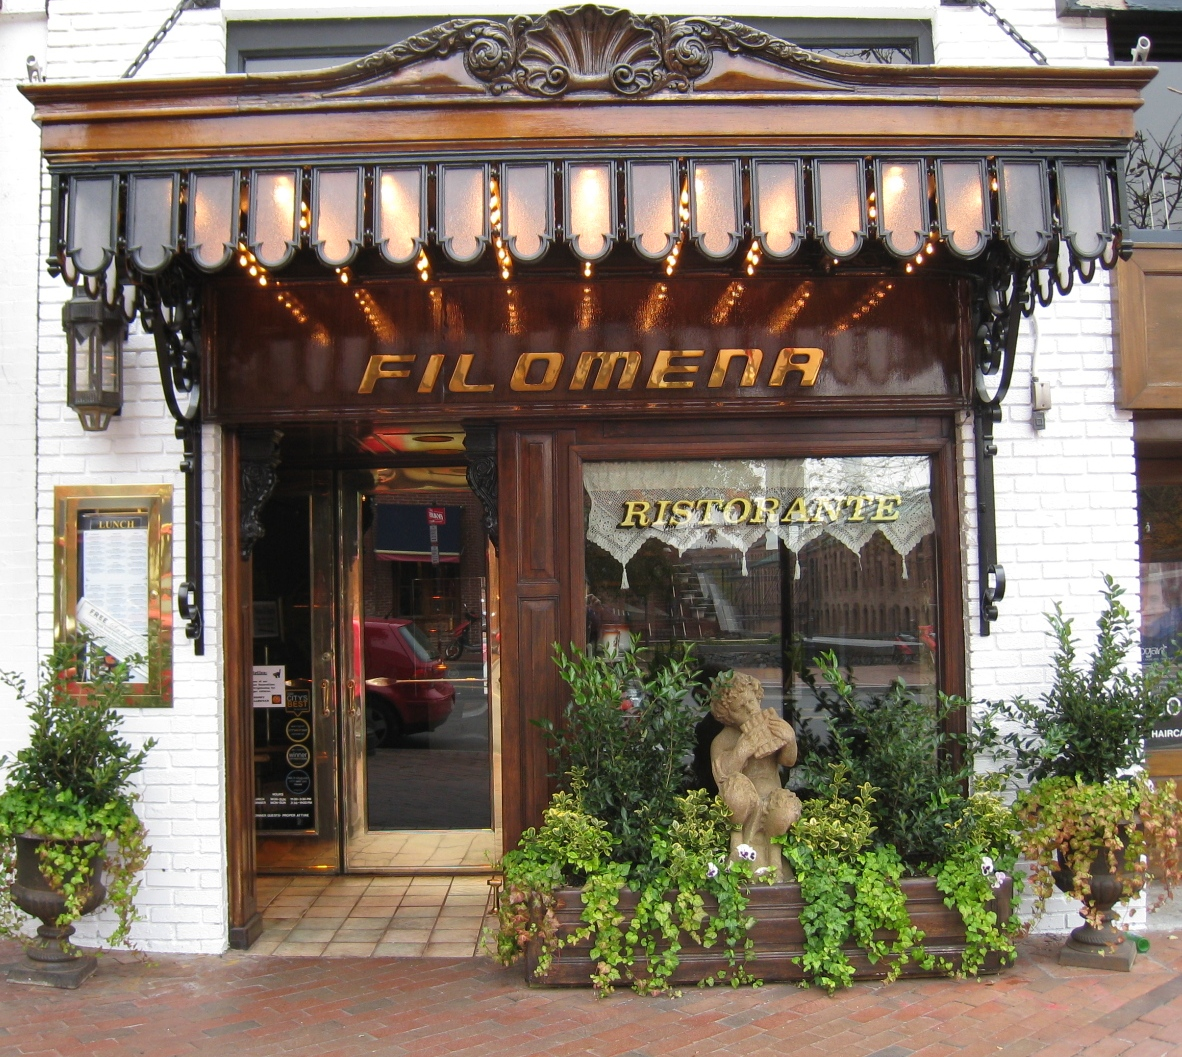 The 10 best restaurants in georgetown washington d c for American cuisine restaurants in dc